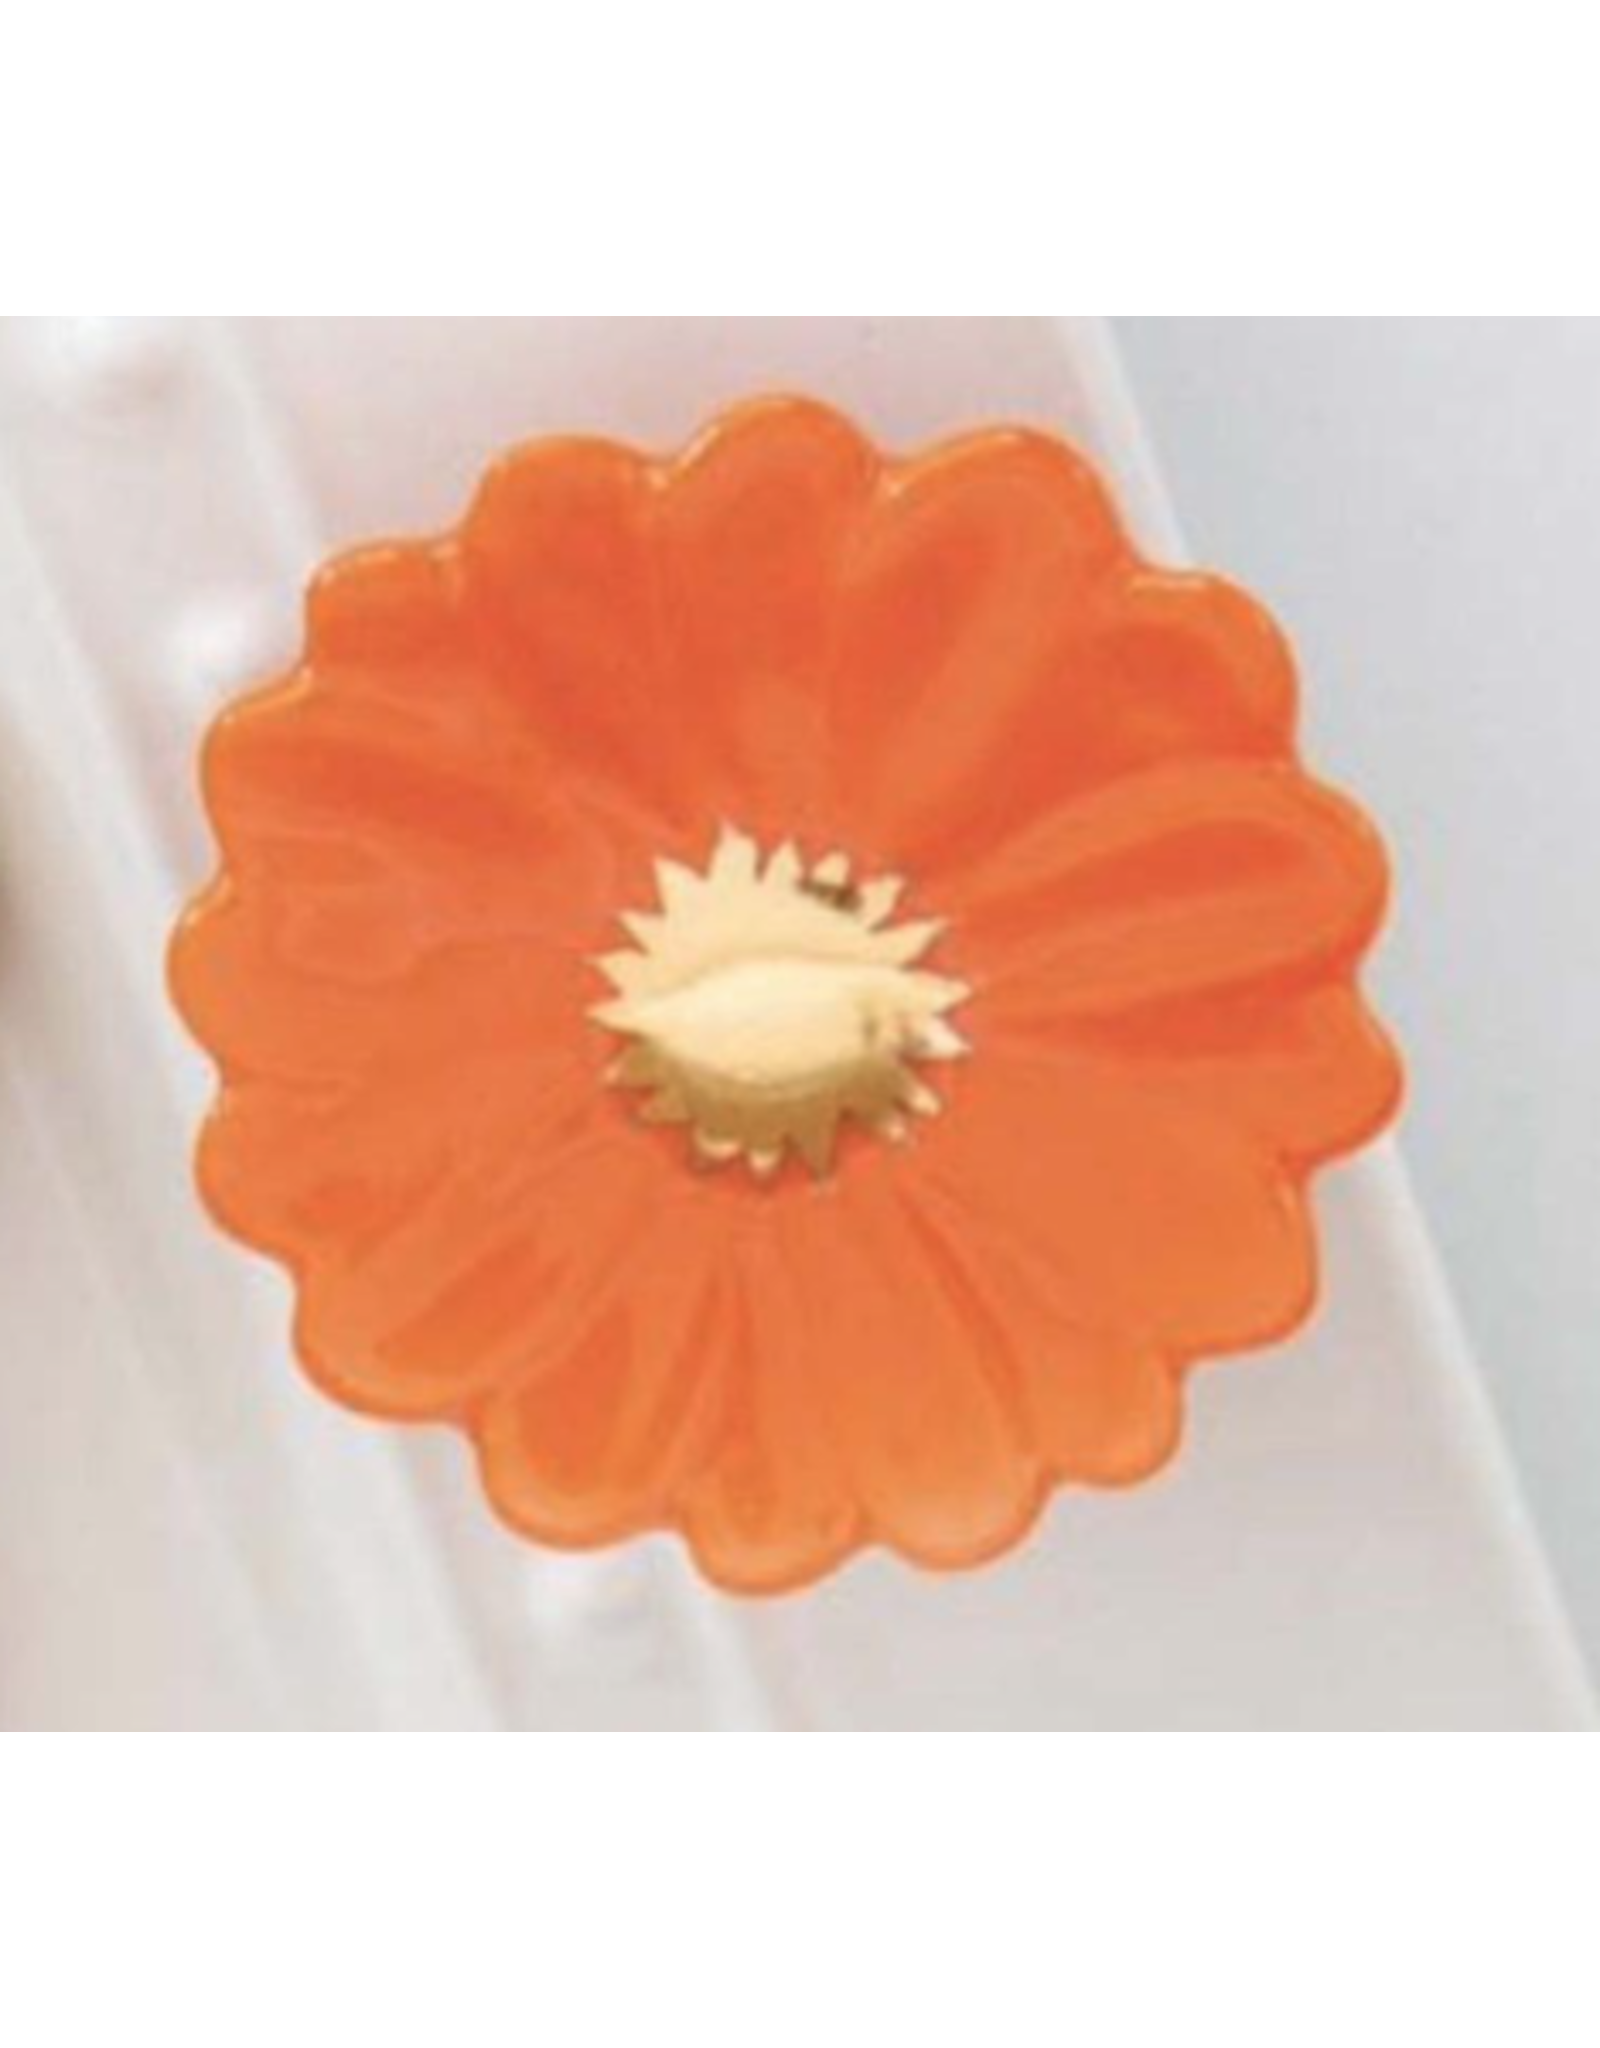 Nora Fleming Mini Gerber Daisy (Orange Flower)